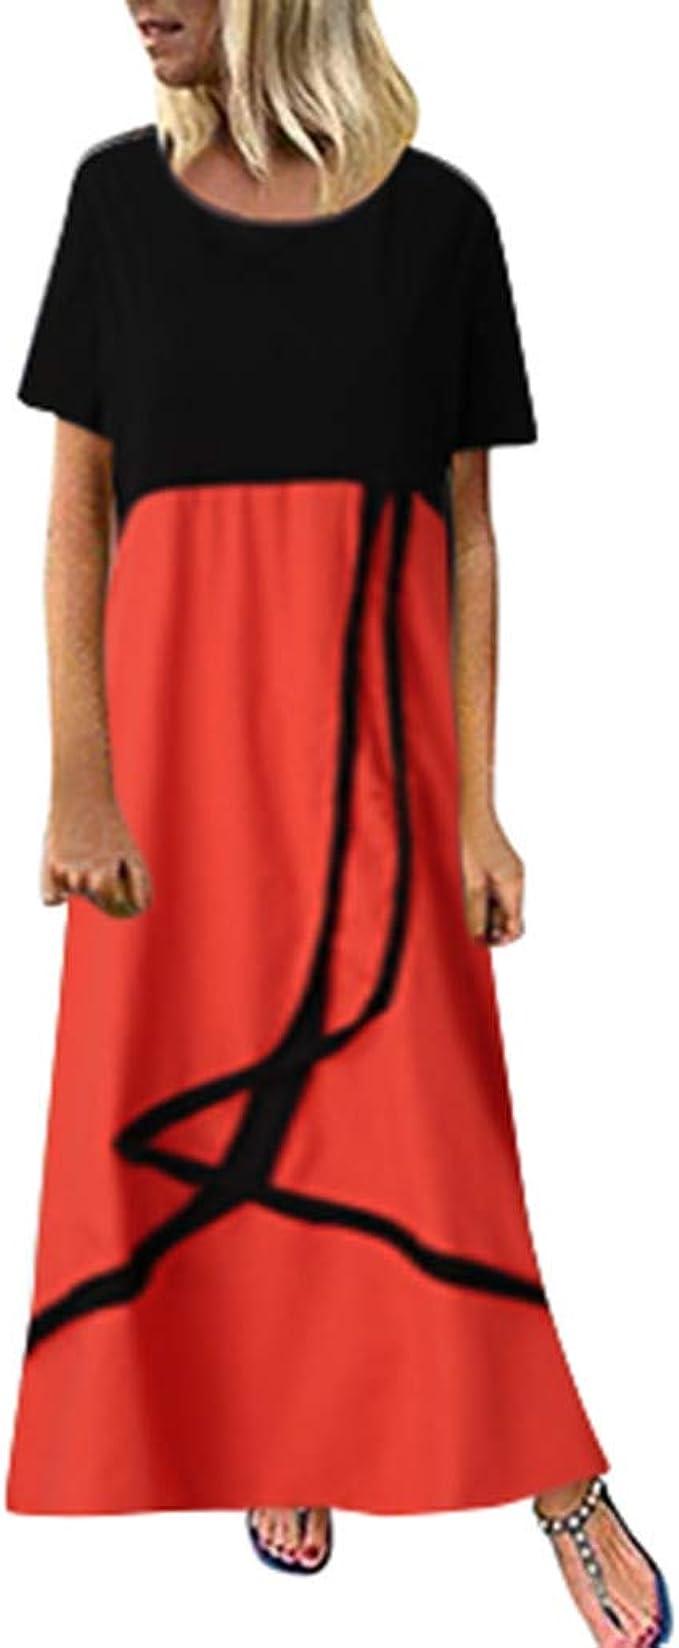 Amphia Damen Elegant Lang Maxikleid Abendkleid,Lose Größe